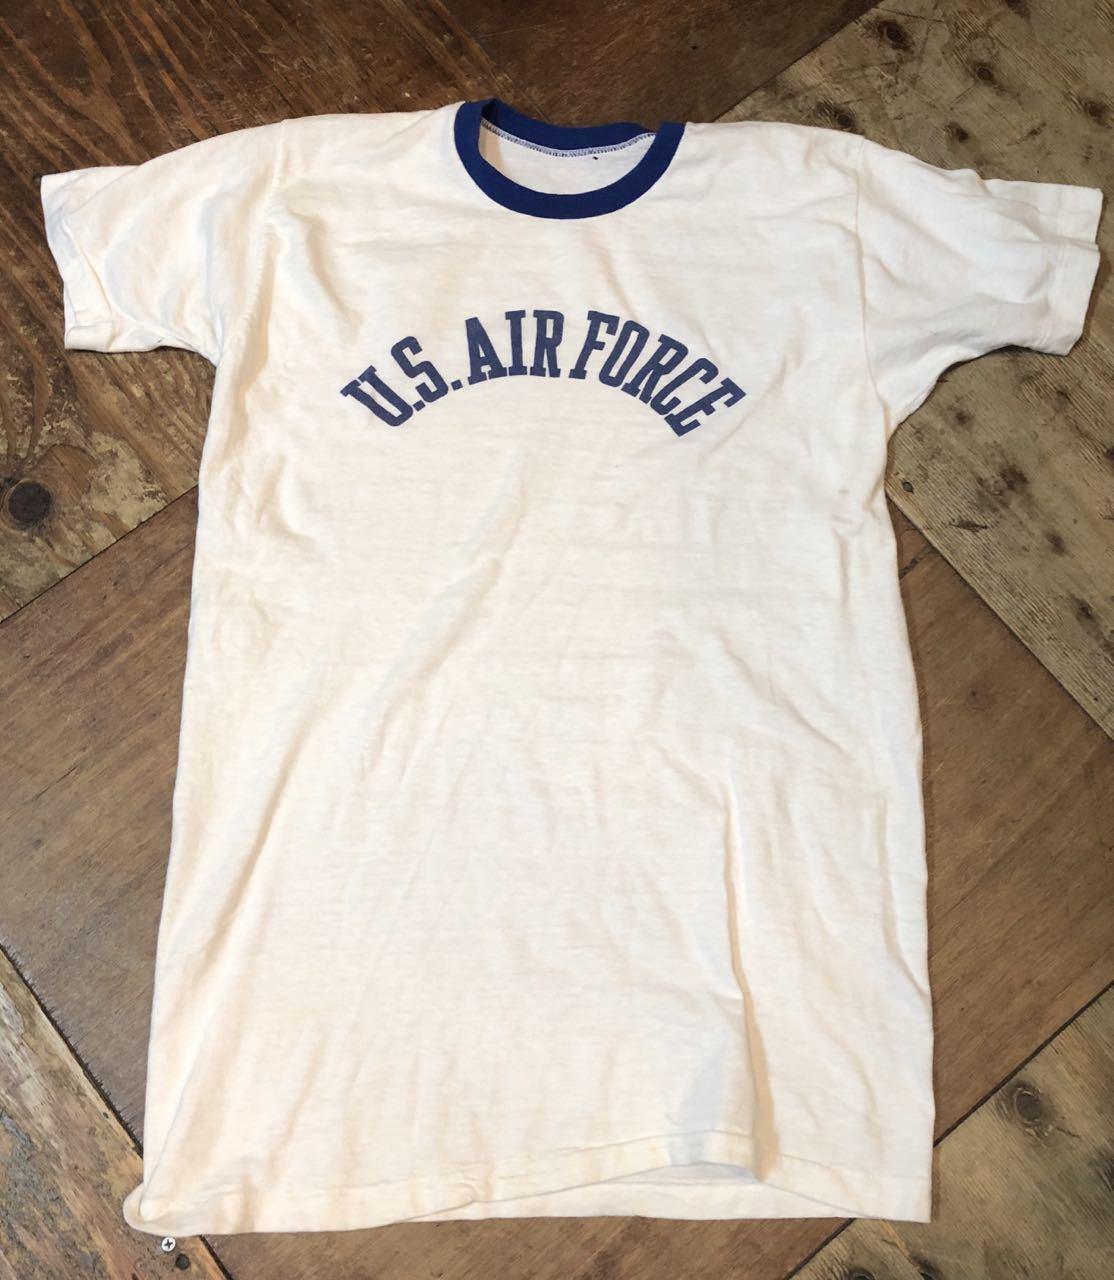 5月18日(土)入荷! 70s  U.S.A.F  all cotton 染み込み Tシャツ!_c0144020_13360368.jpg